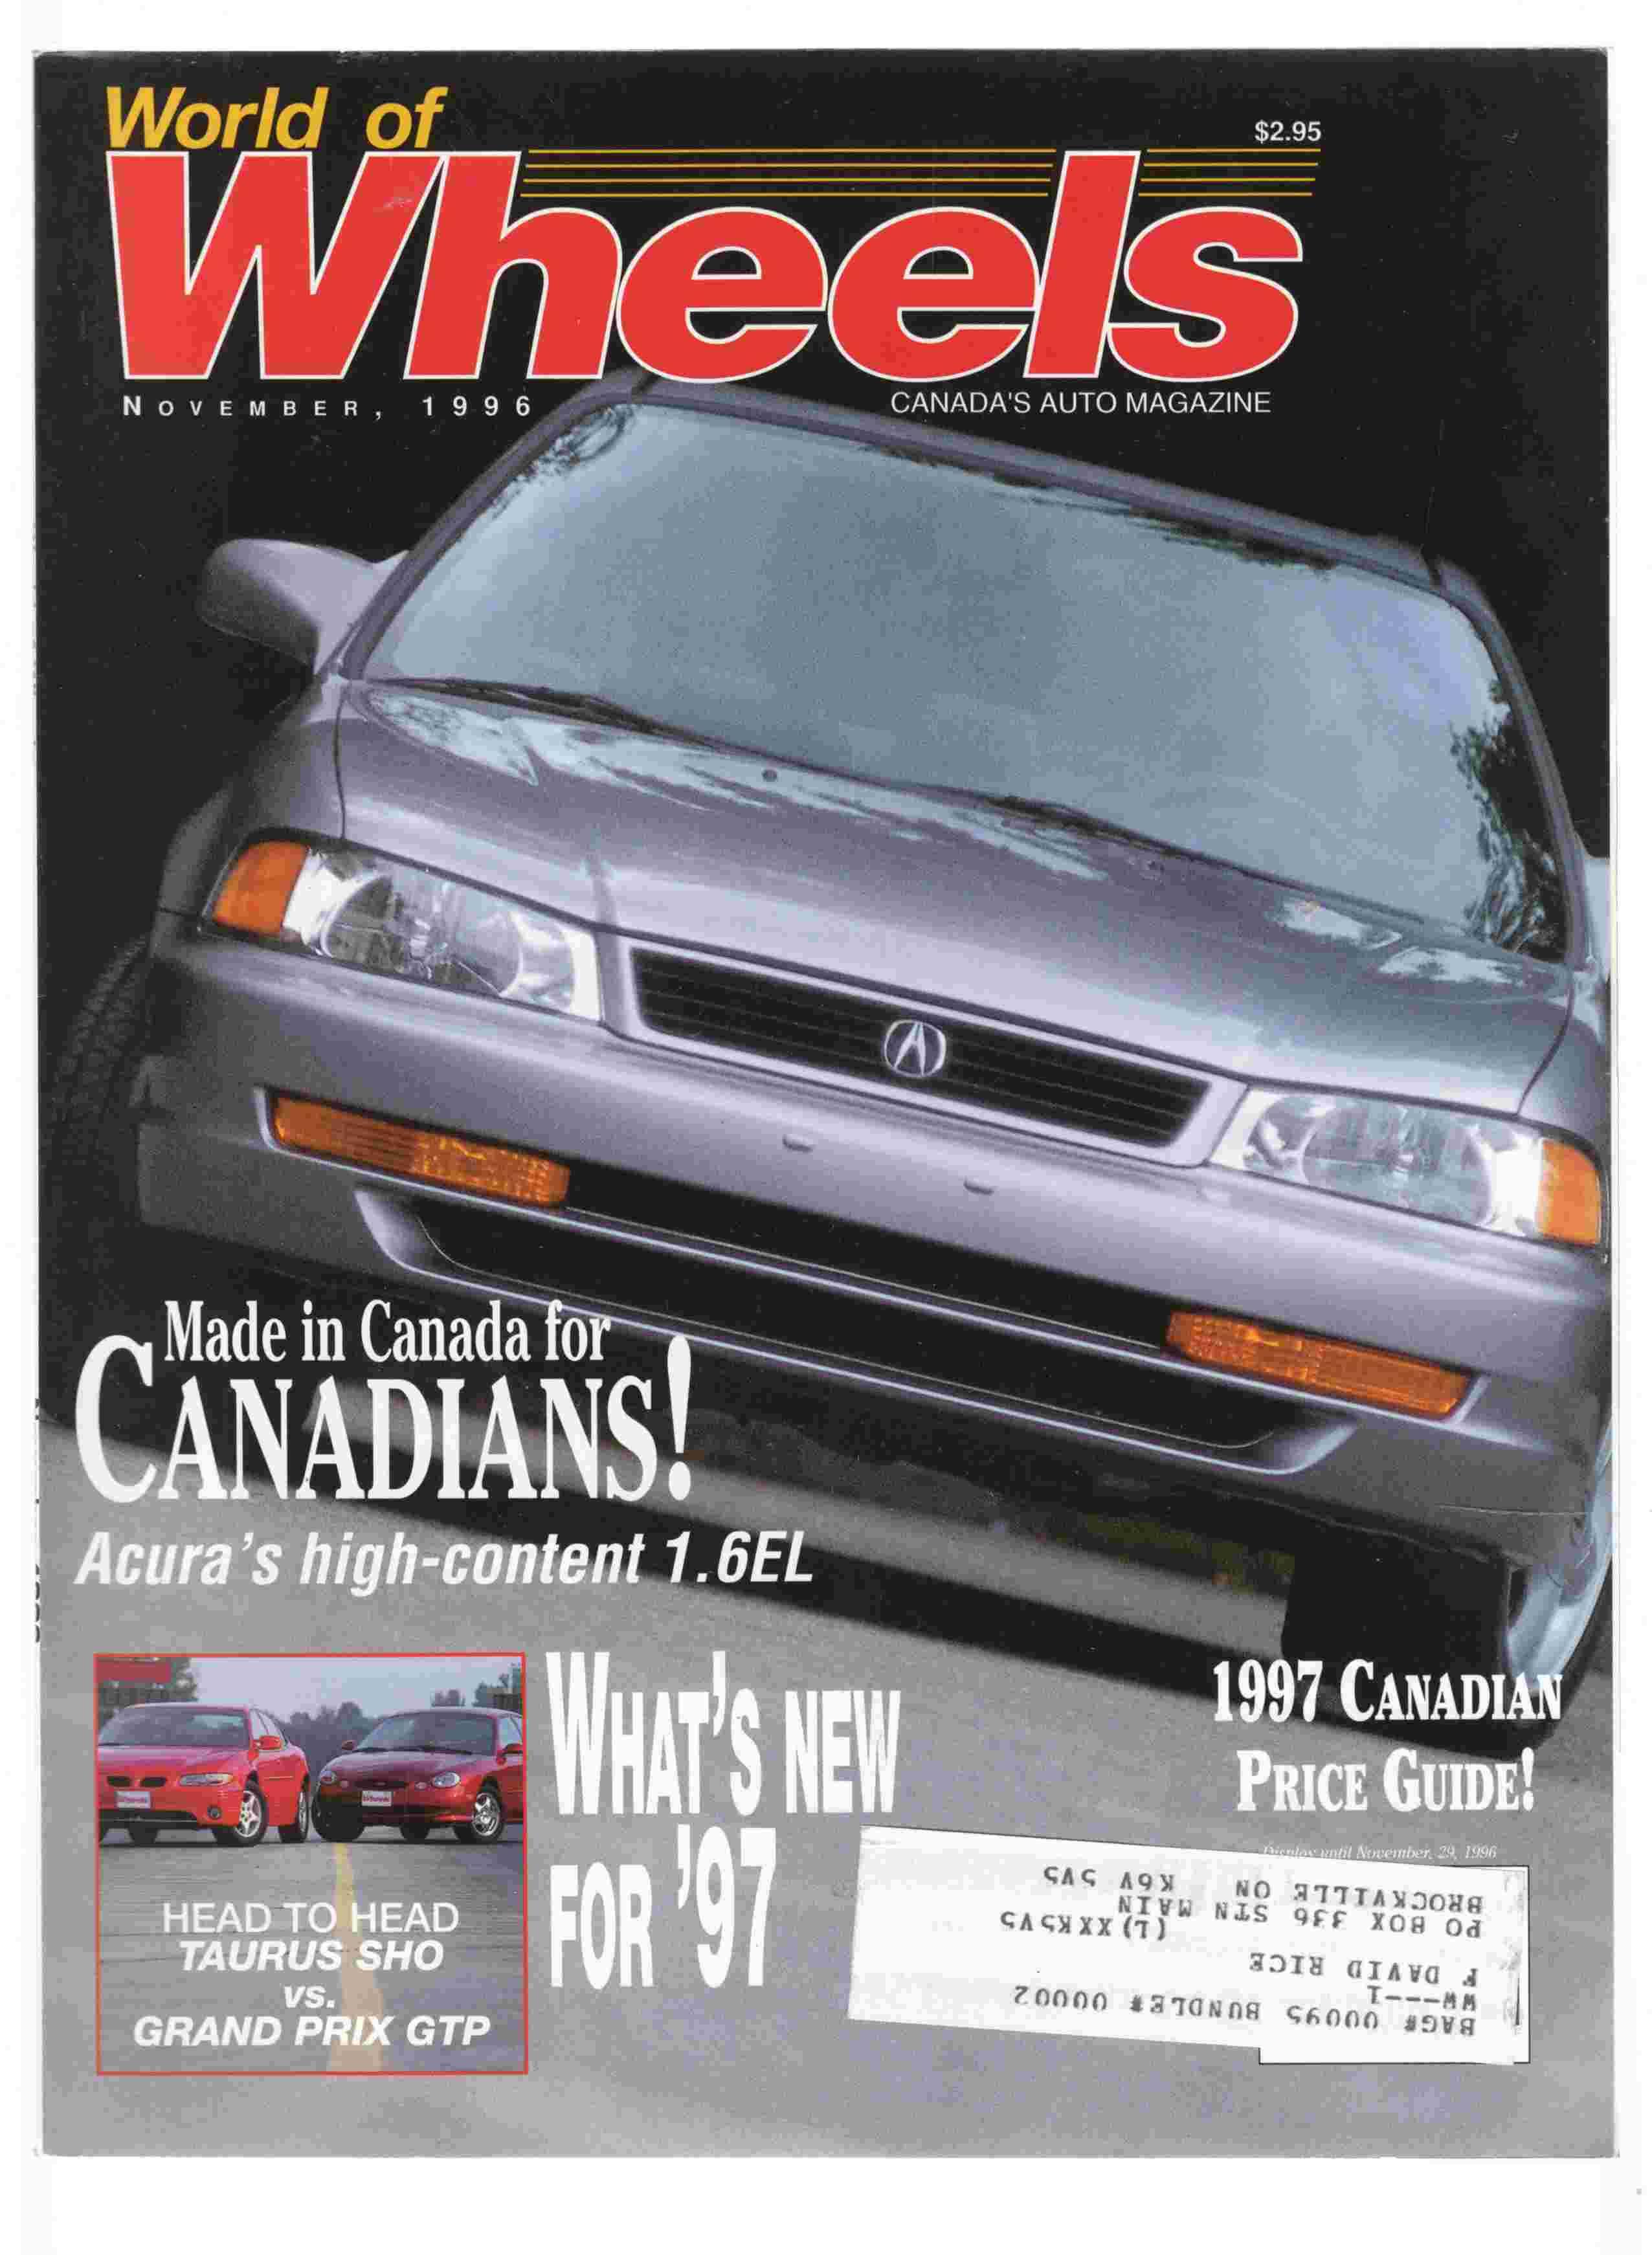 World of Wheels Canada\'s Auto Magazine November, 1996 Vol. 14, No. 5